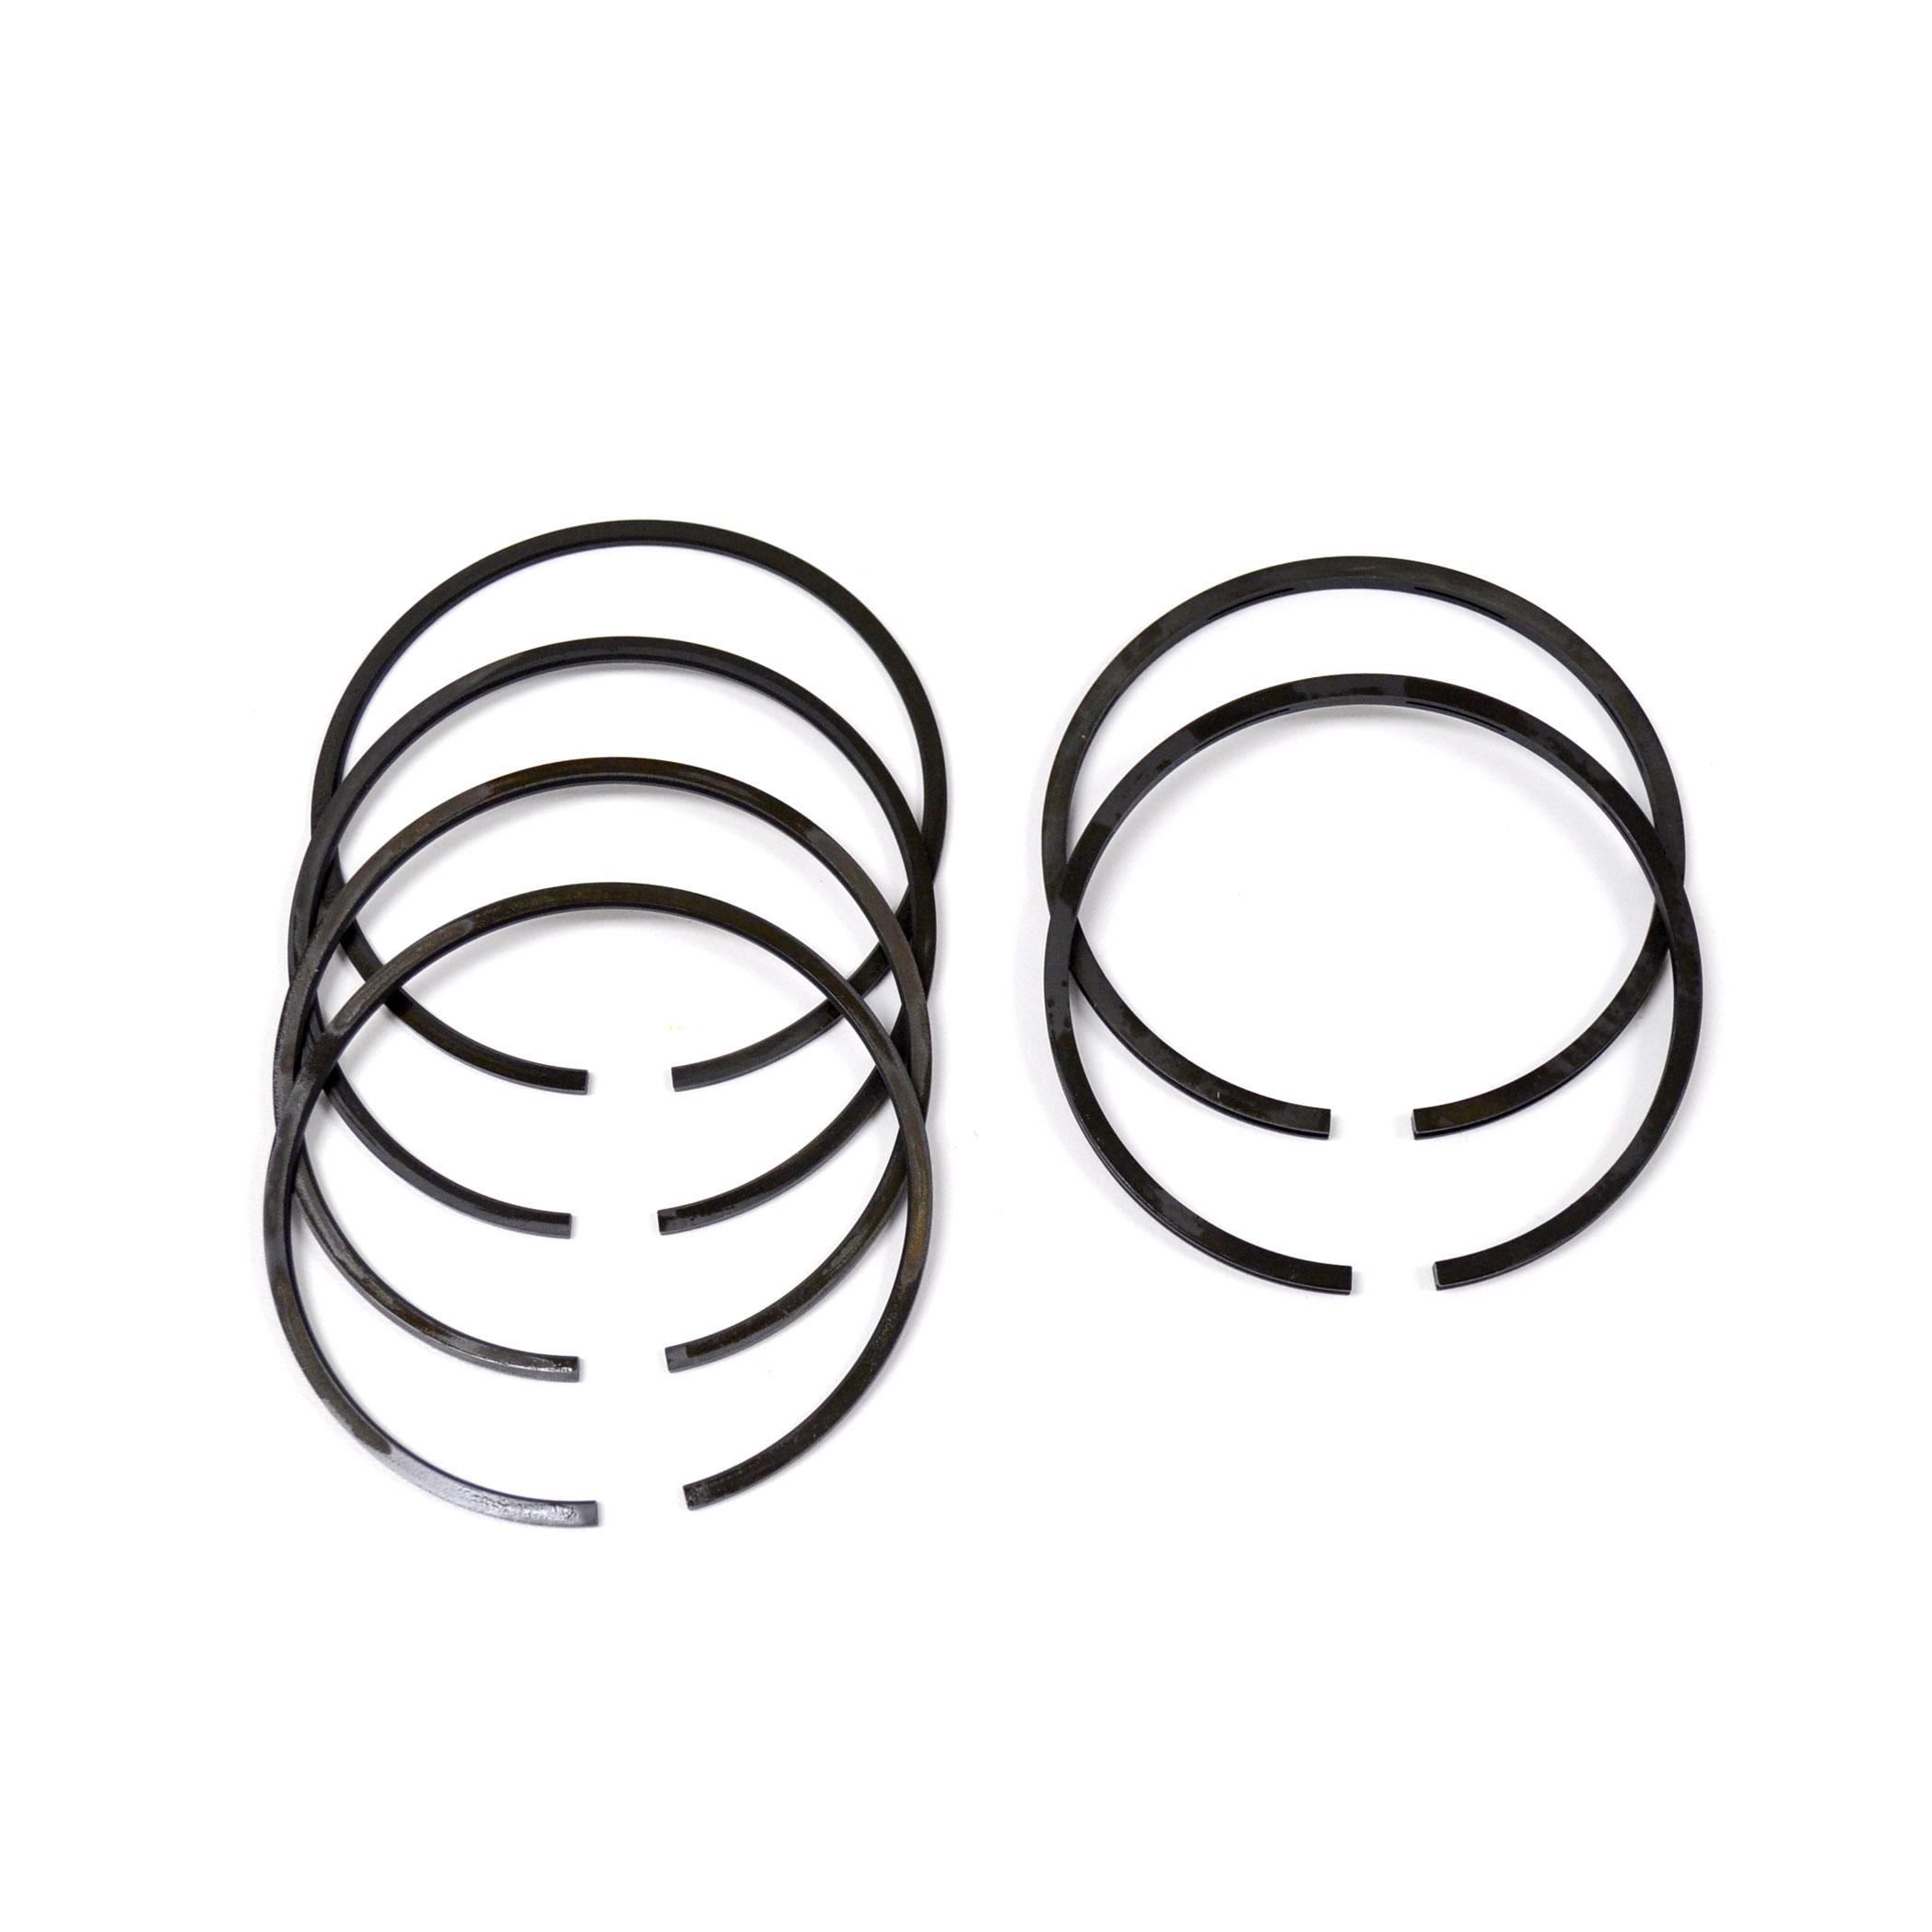 triumph tr6 t120 650 tai economy piston ring set standard